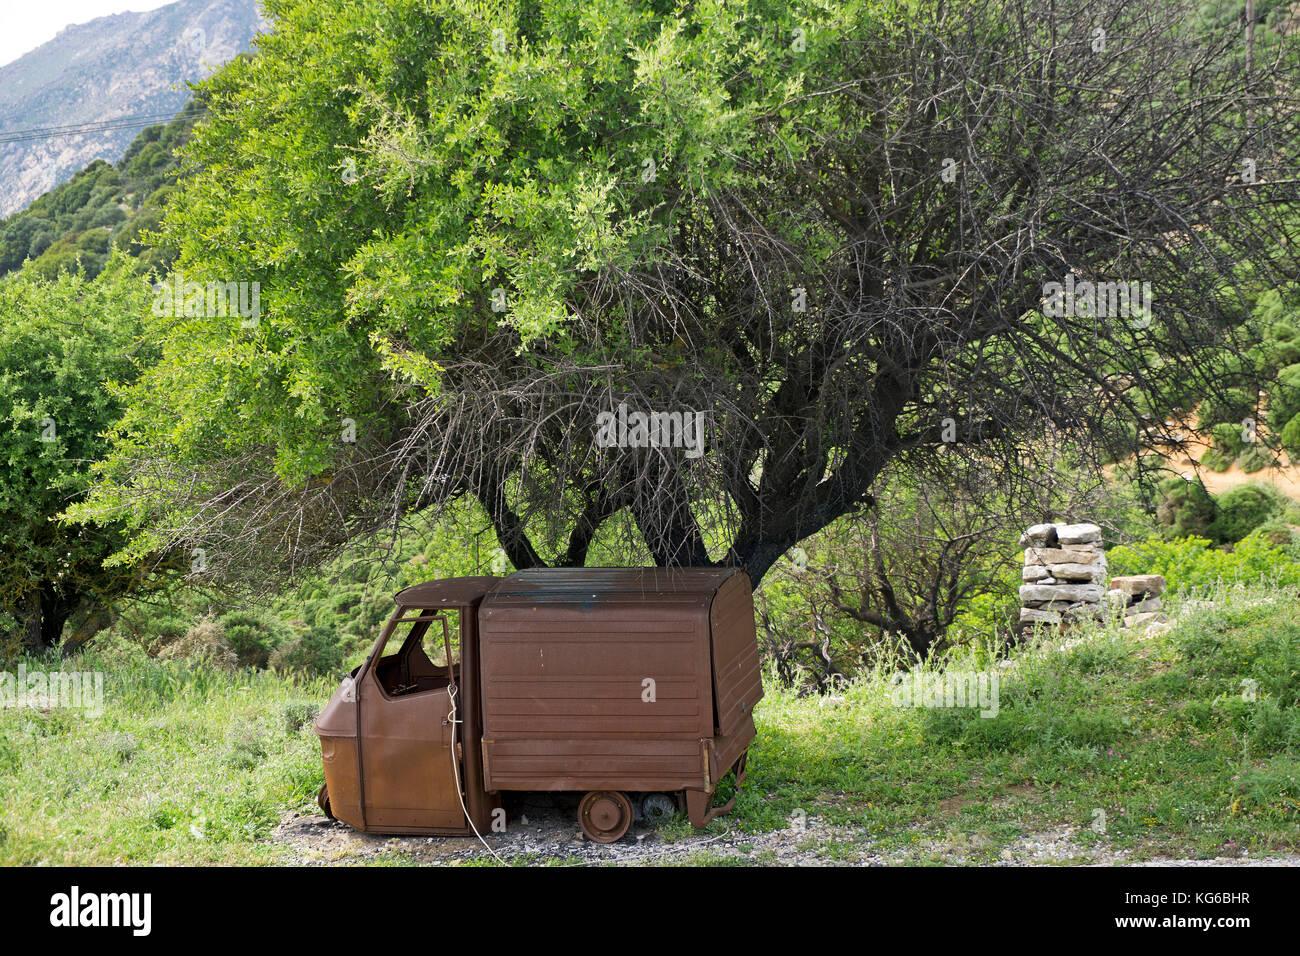 Car wreck under a tree at a road, Naxos island, Cyclades, Aegean, Greece Stock Photo